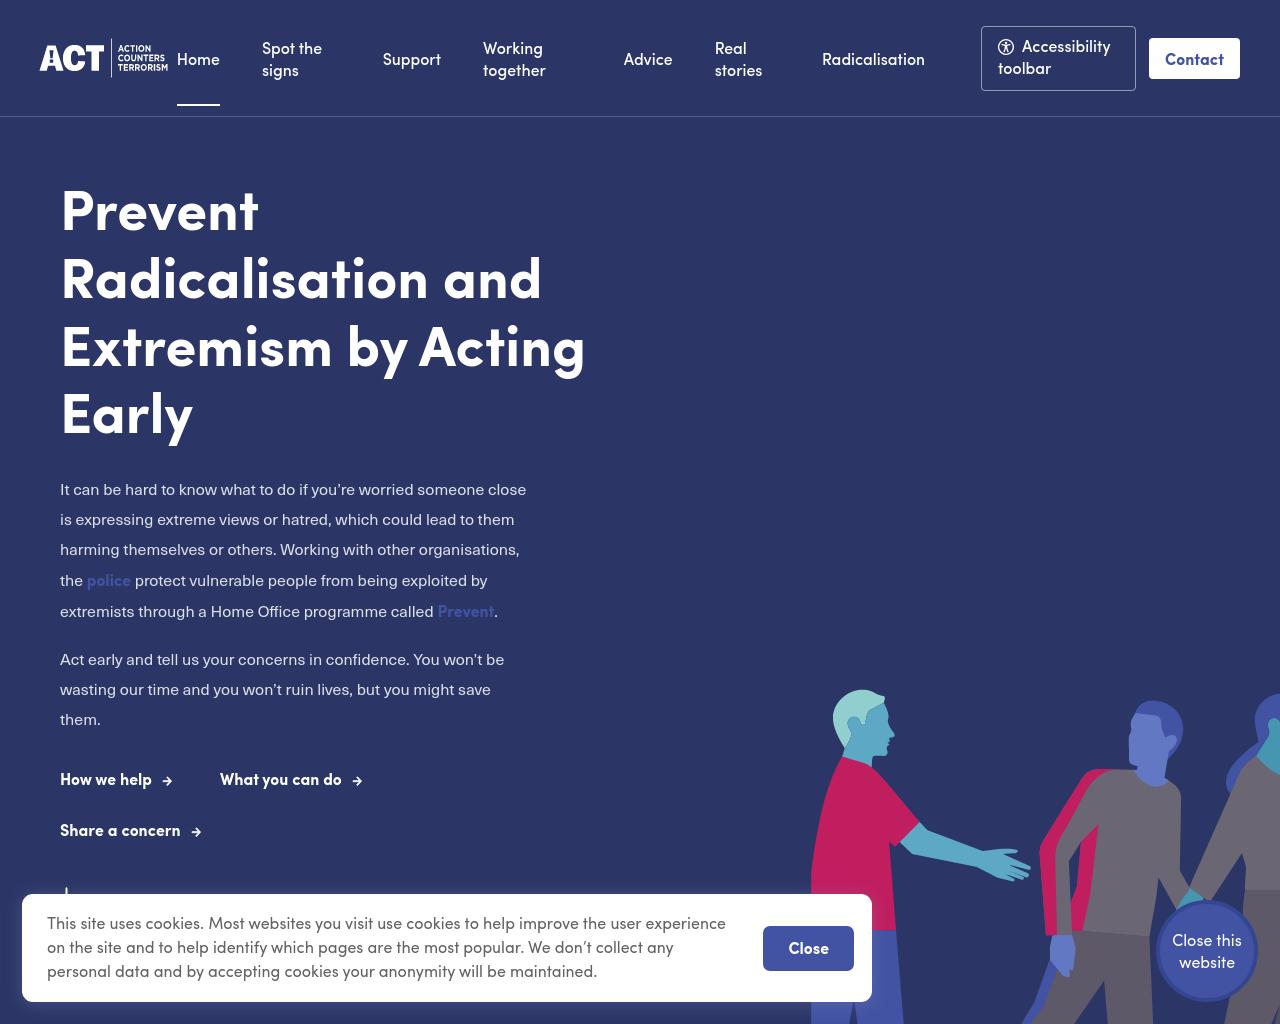 Prevent website